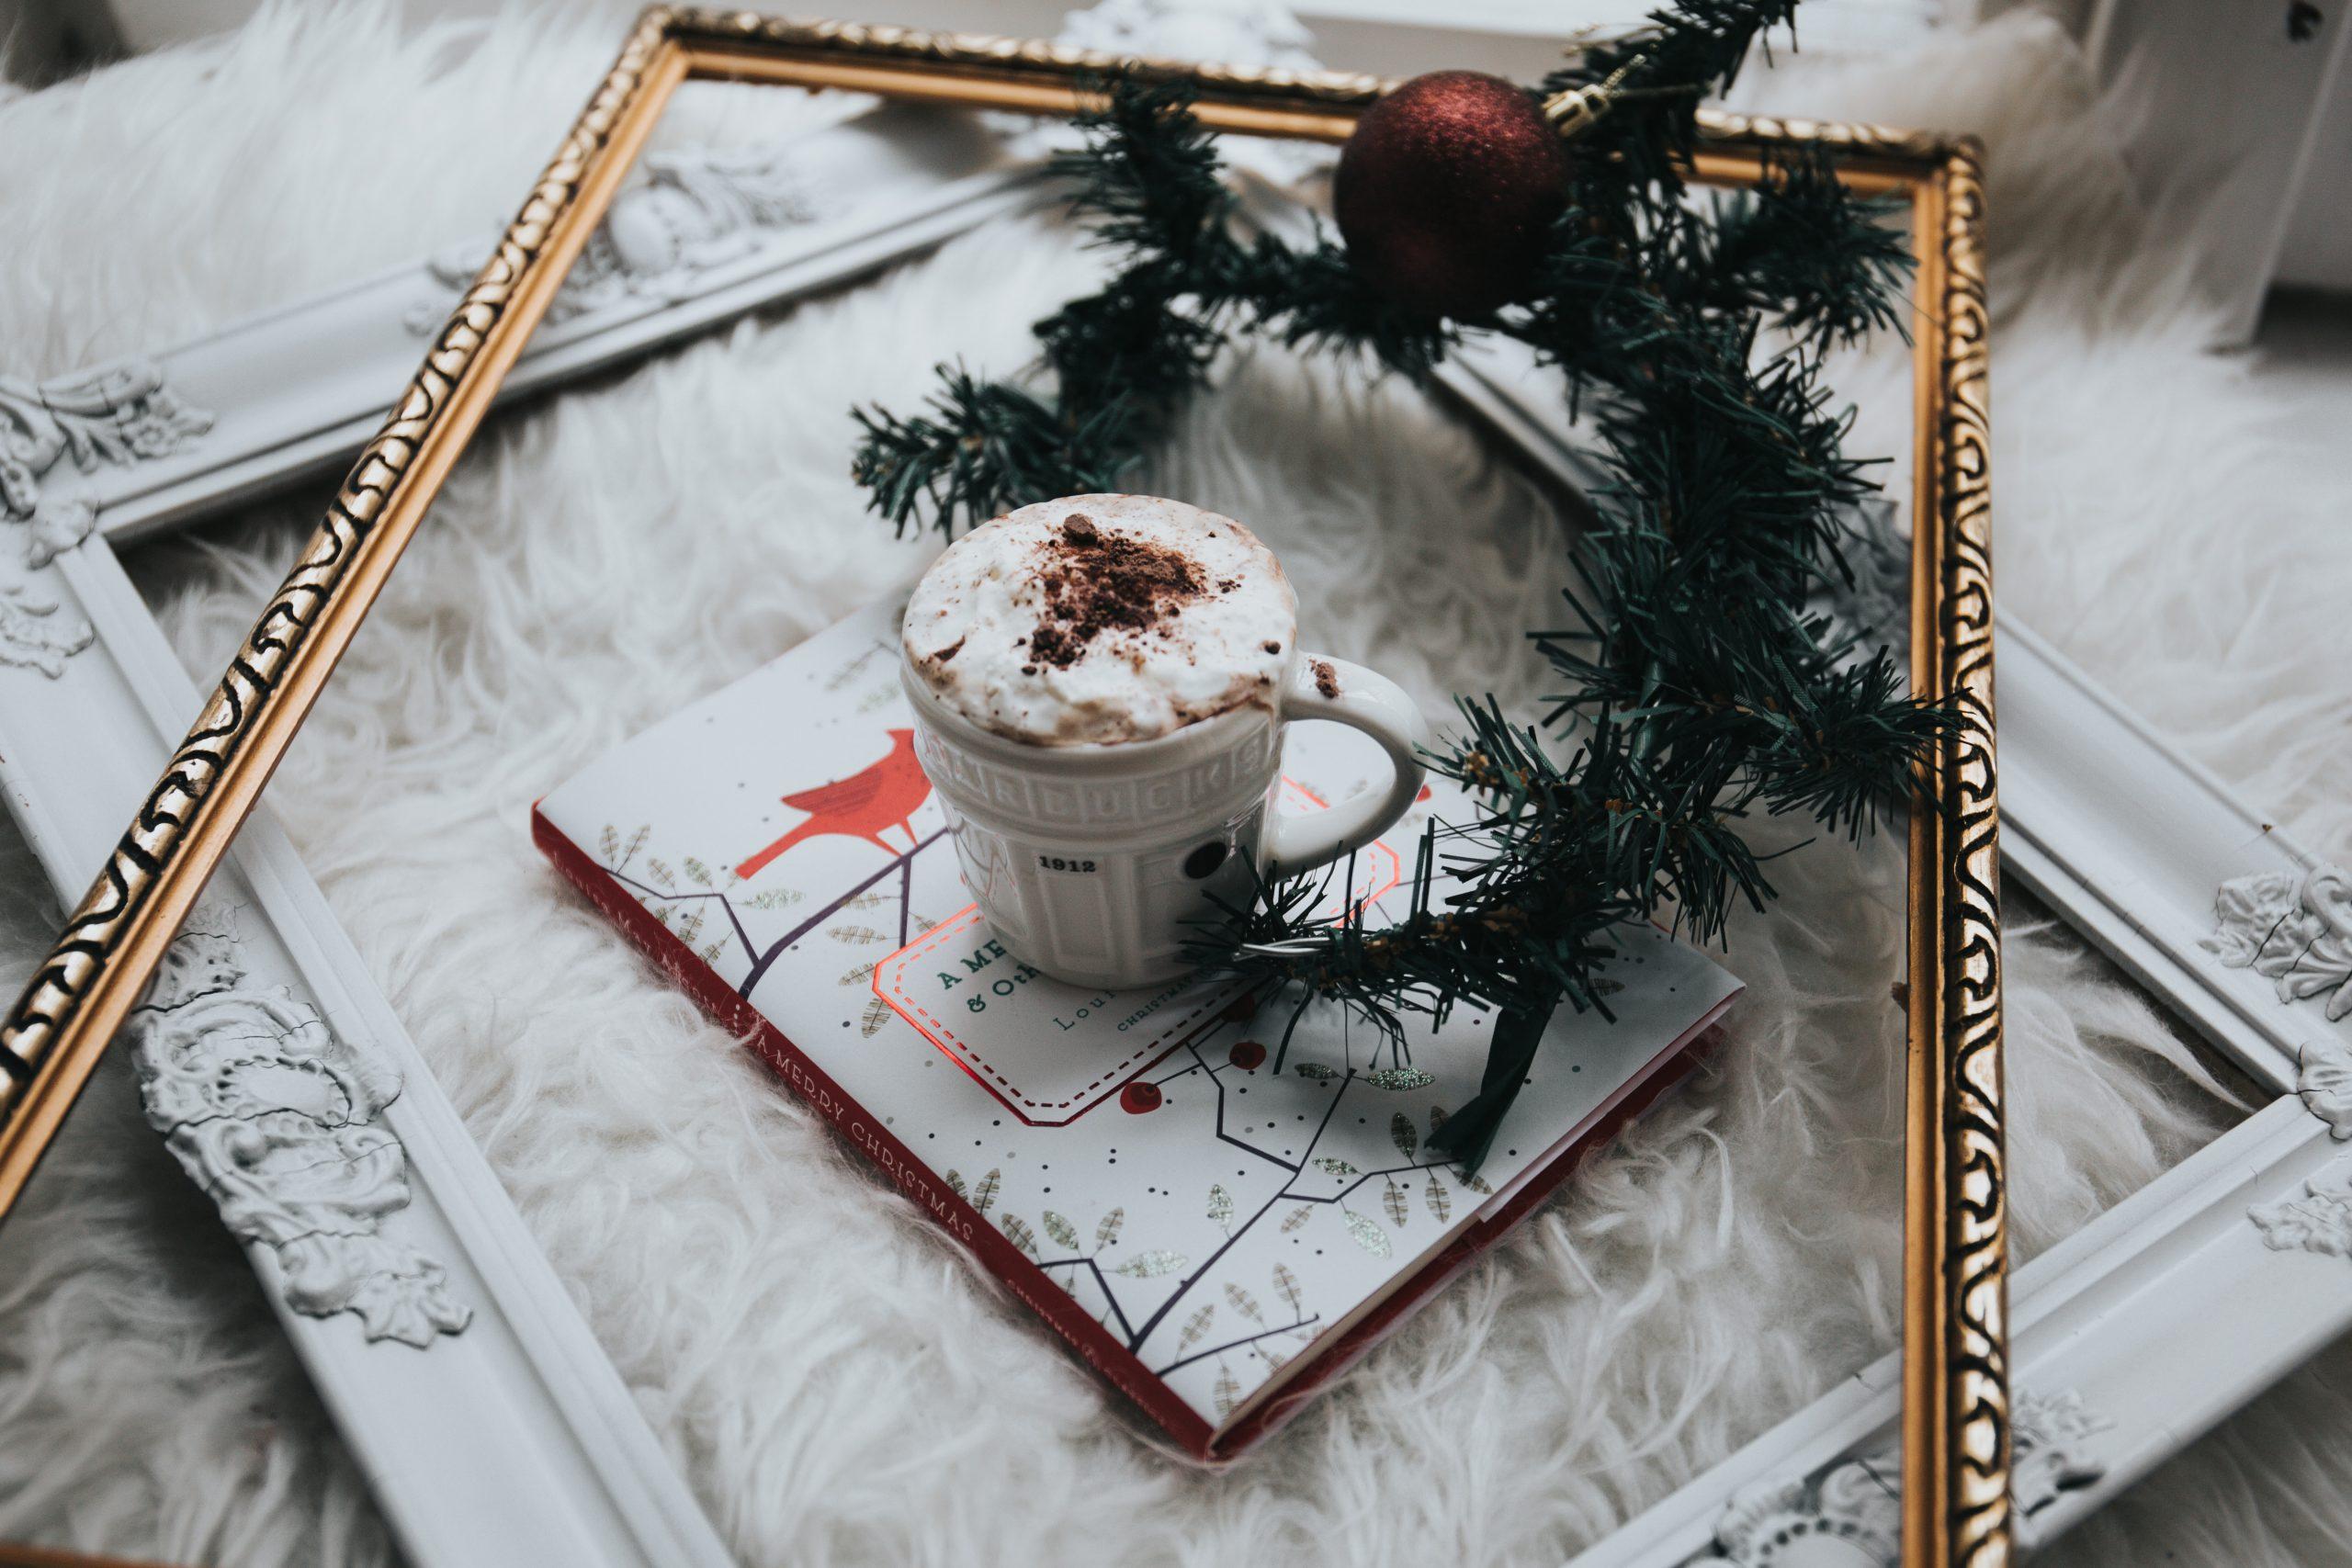 wallpaper White ceramic mug filled with whit mousse